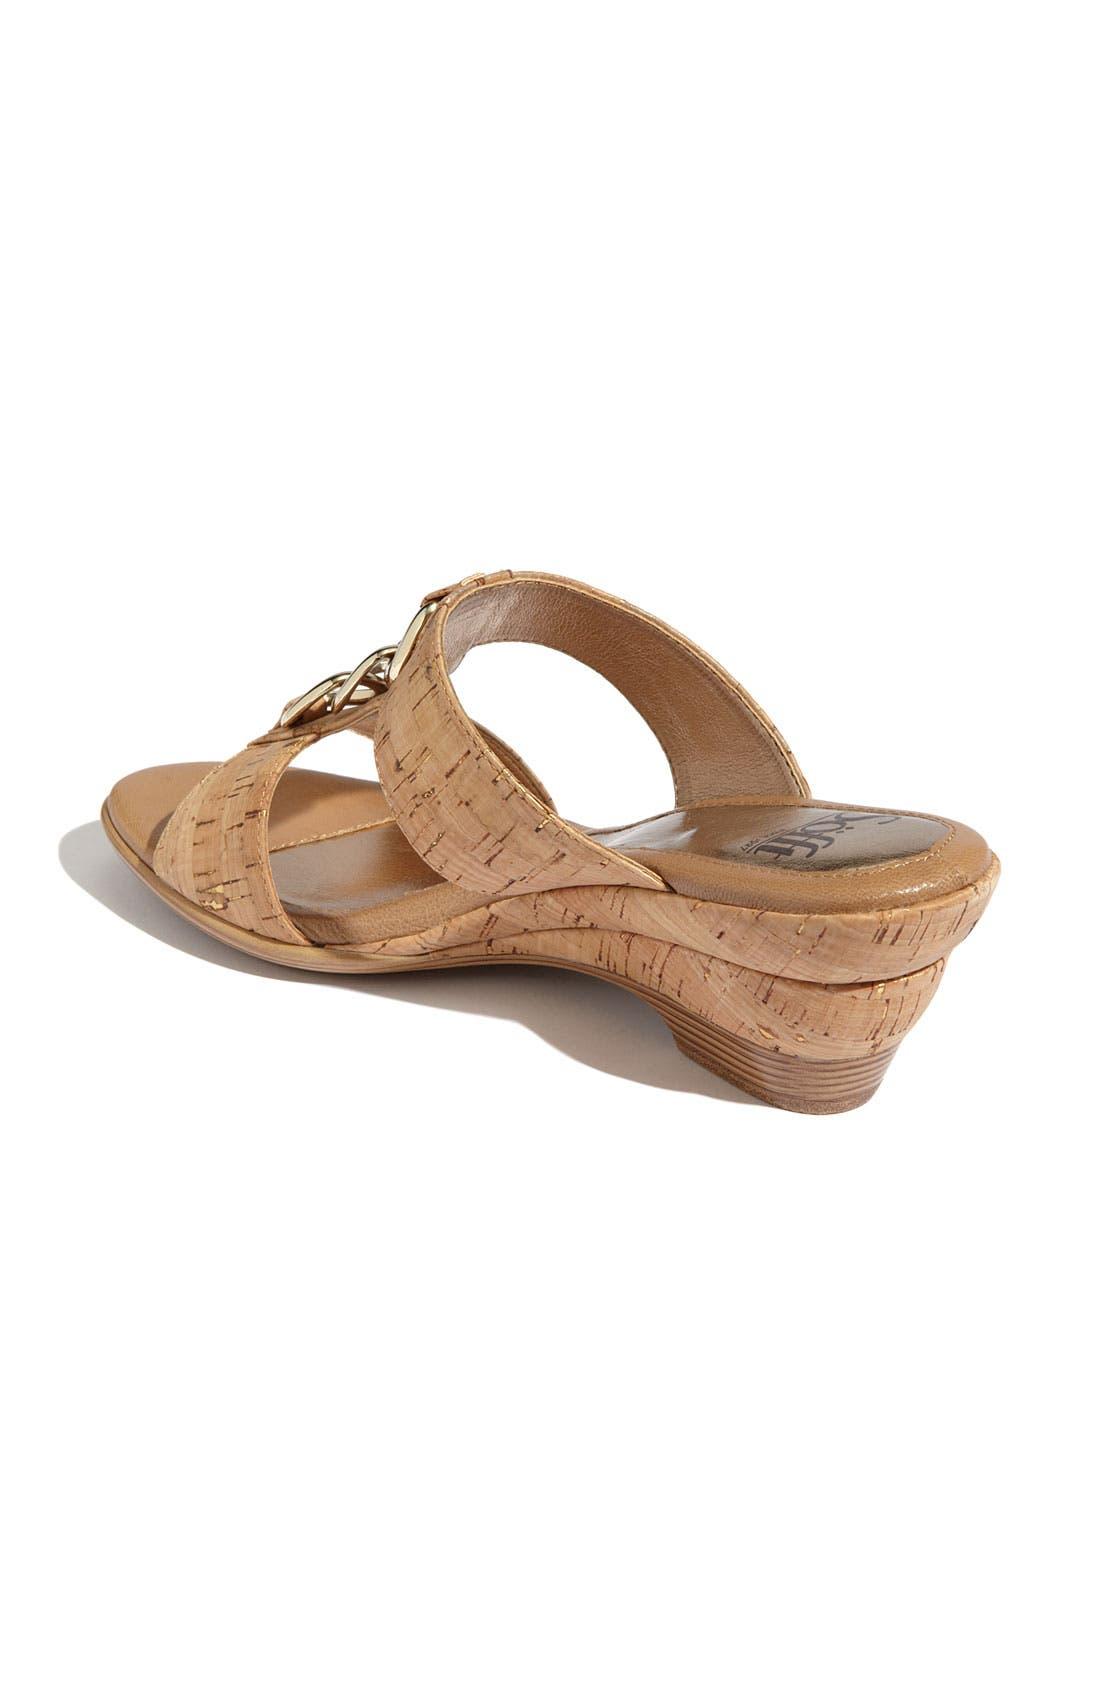 Alternate Image 2  - Söfft 'Ibiza' Sandal